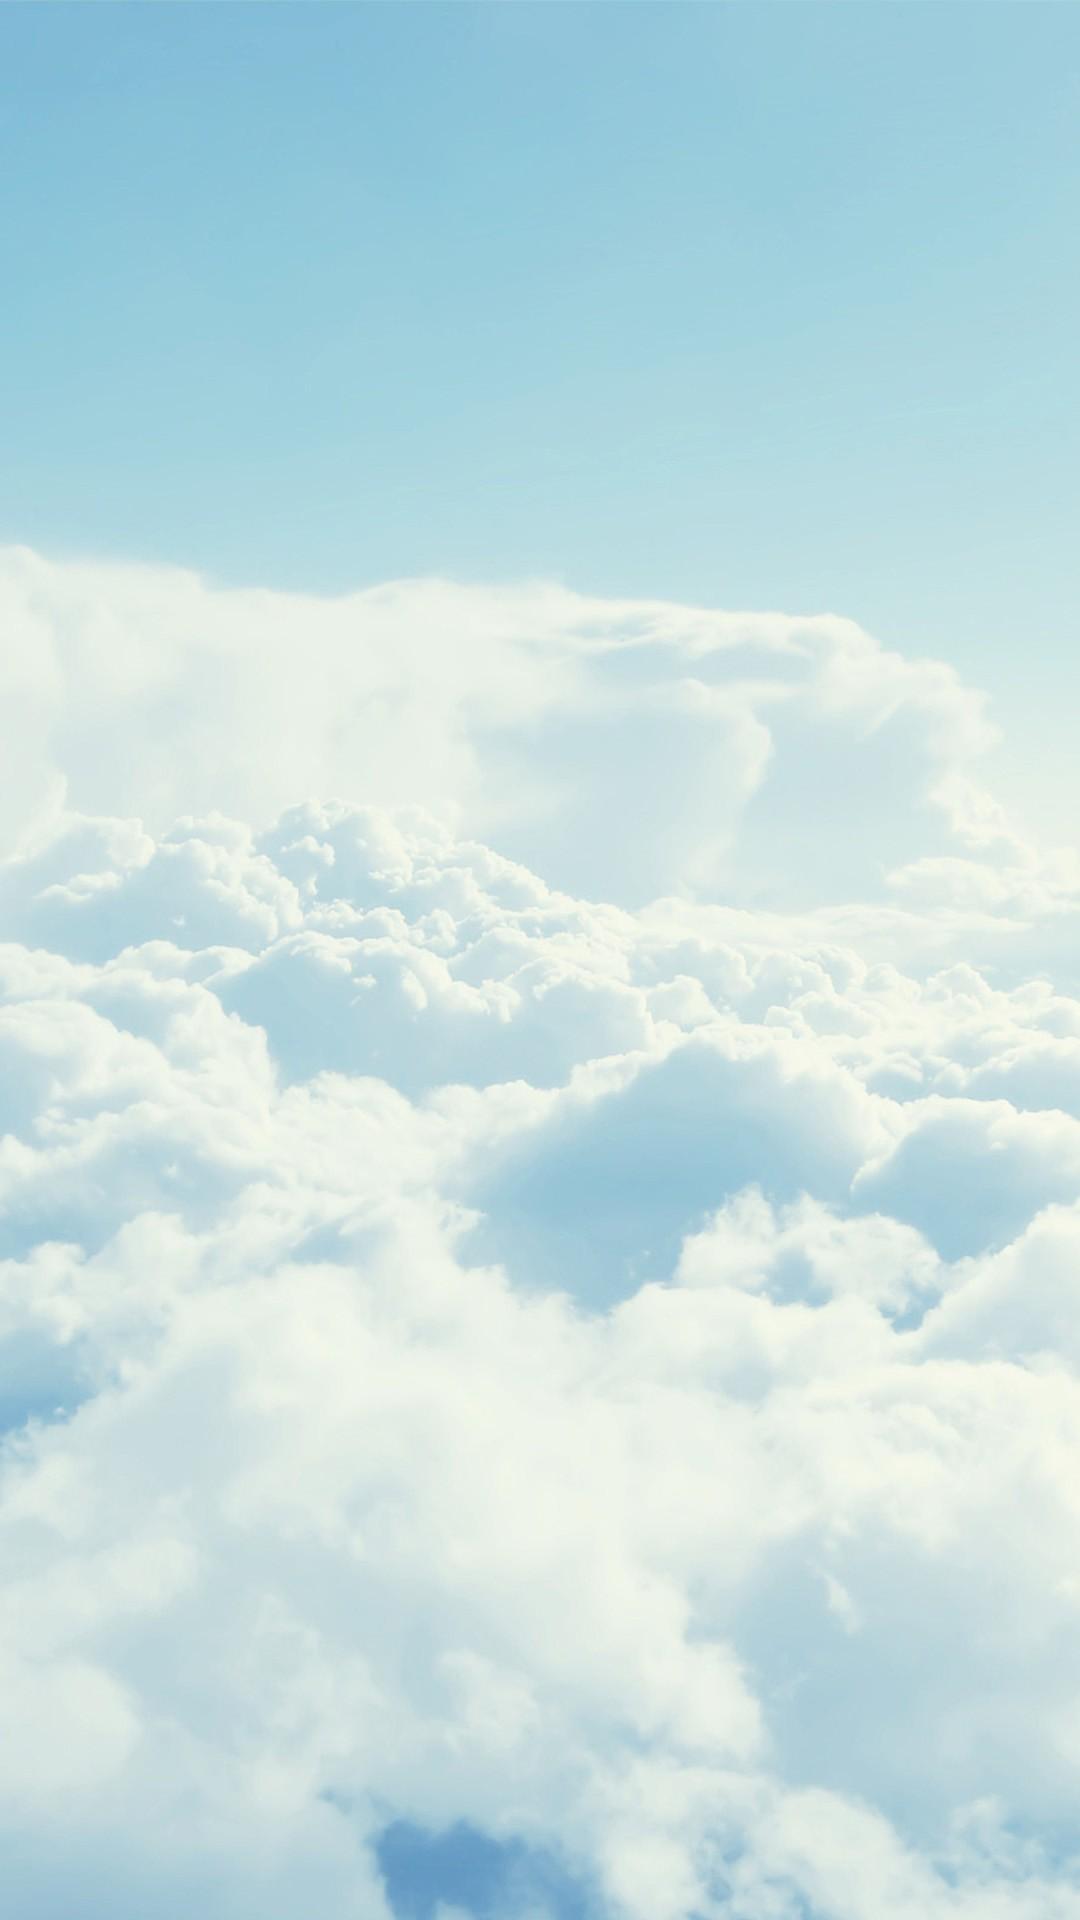 Airplane Wallpaper Iphone 7 Clouds Iphone Wallpapers Pixelstalk Net